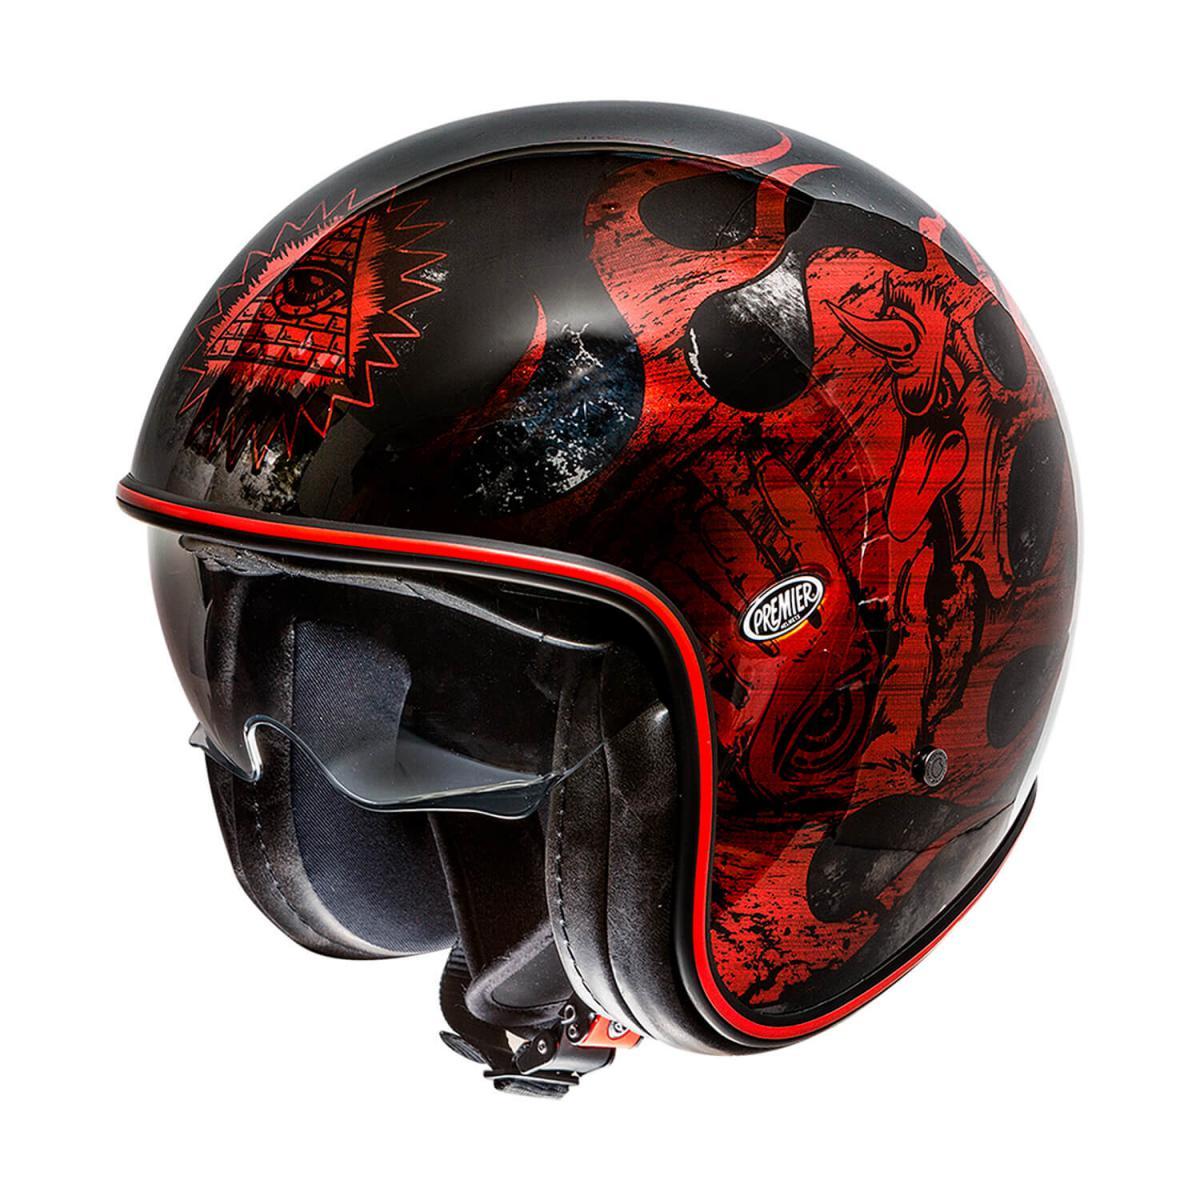 8a7e097411cb http://www.powerbike .hu/shop/bukosisakok/premier-jet-vintage-bd-red-chromed-nyitott-bukosisak